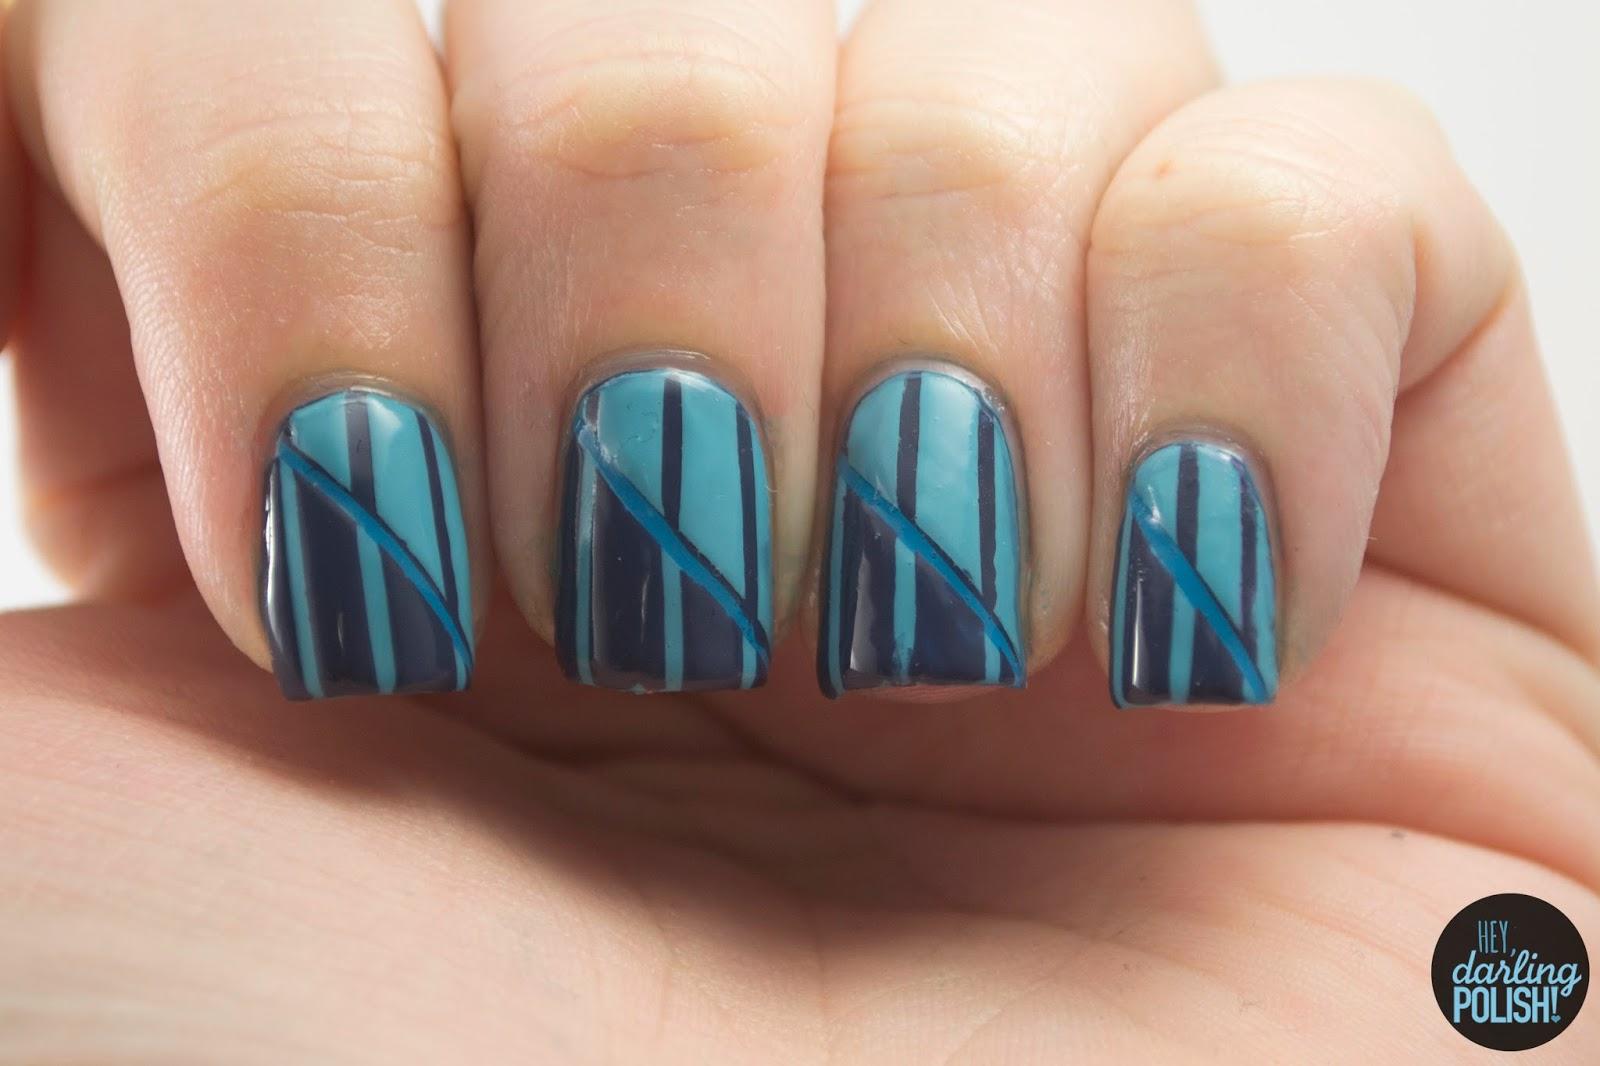 nails, nail art, nail polish, polish, stripes, blue, hey darling polish, theme buffet, monochrome